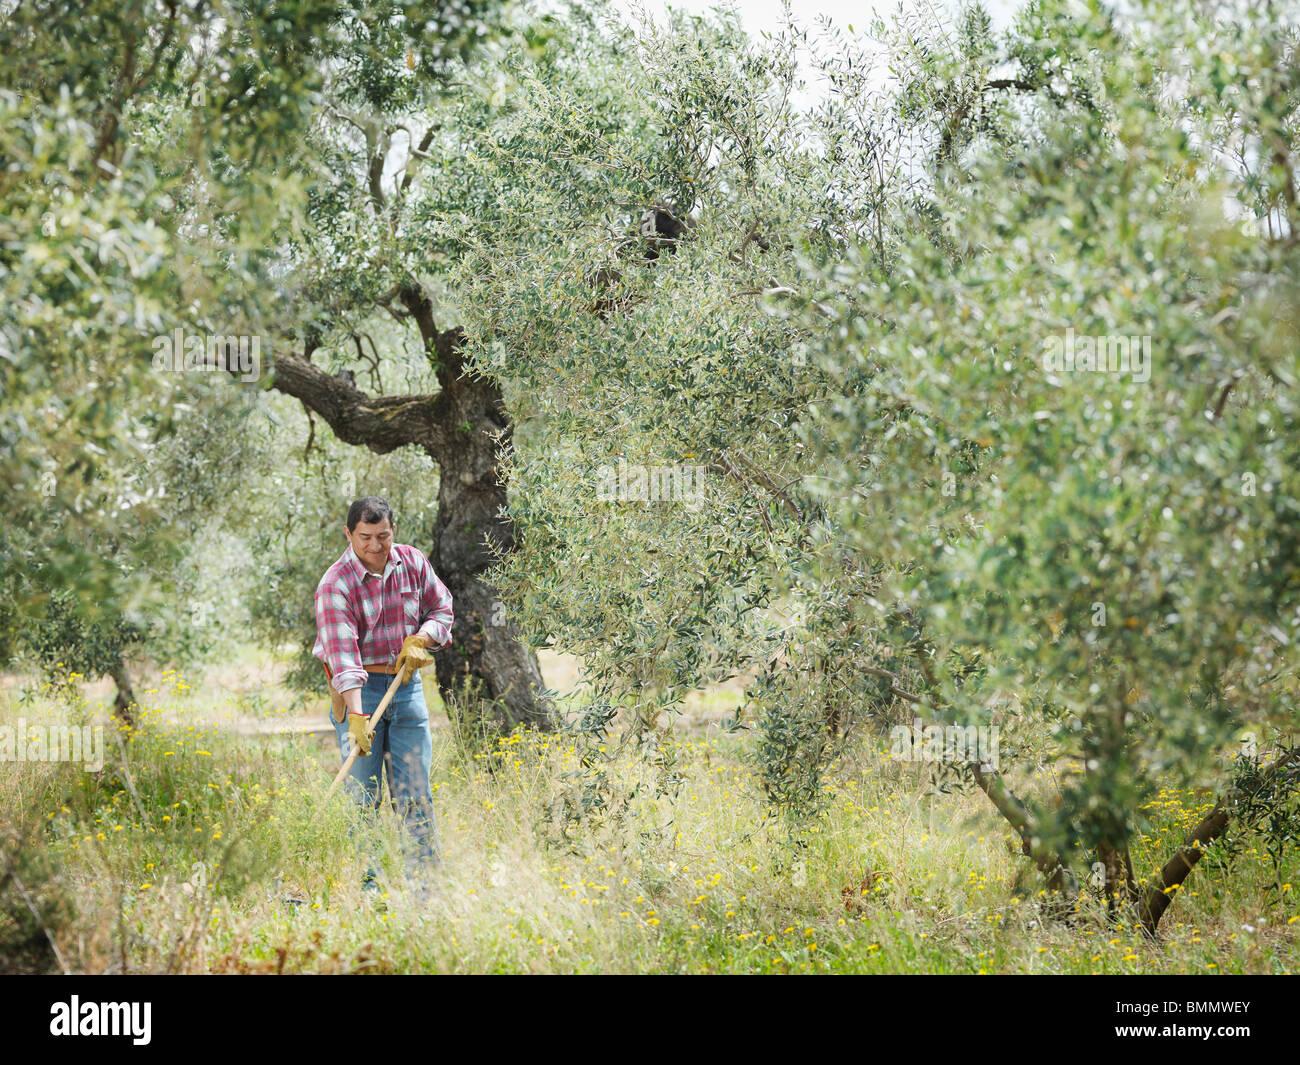 Man raking in olive grove - Stock Image